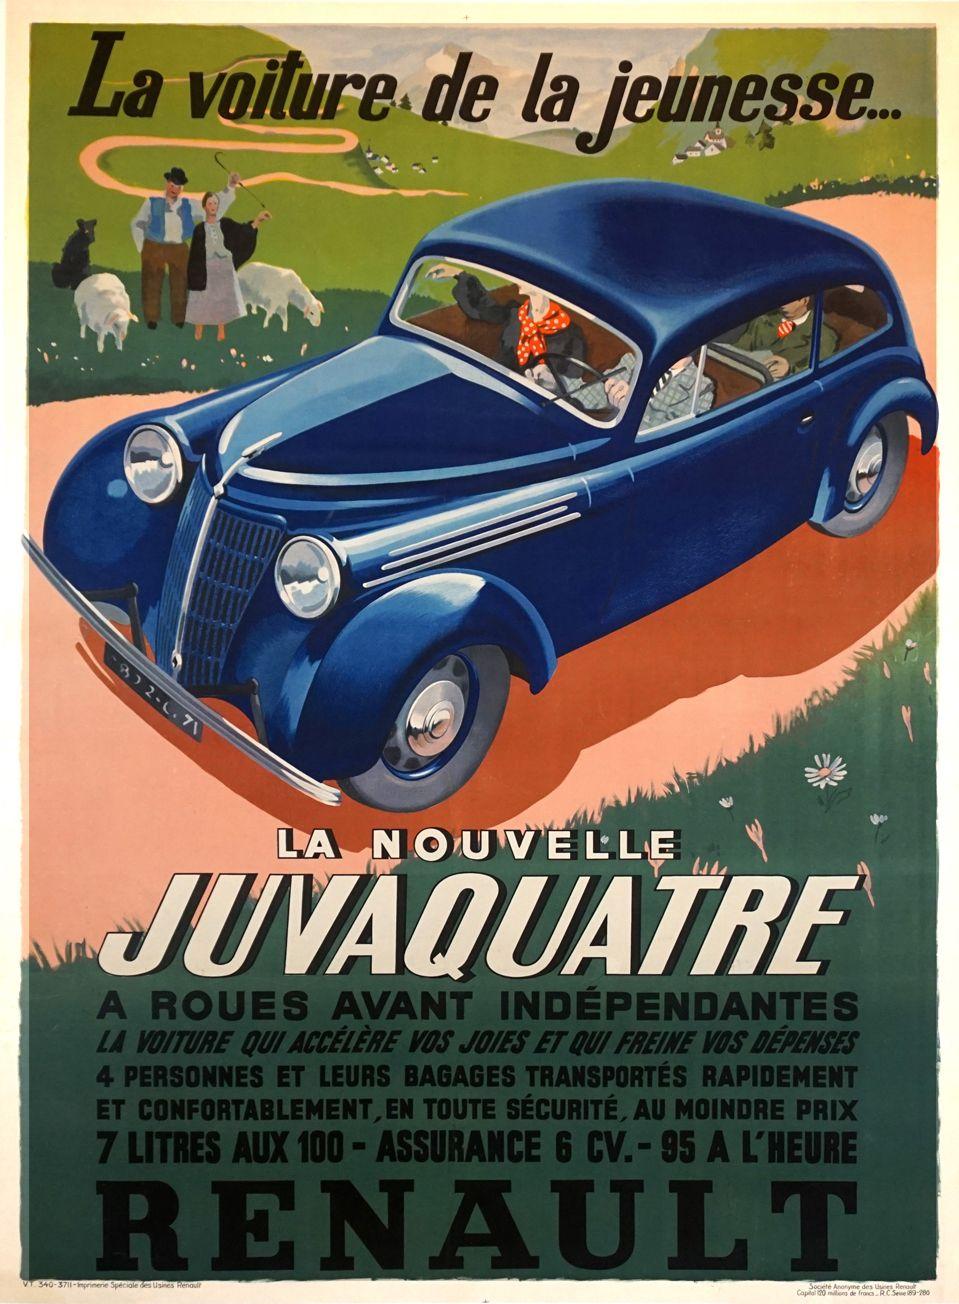 French Vintage Art Deco Automobile Poster For Renault Juvaquatre 1937 Vintage Posters By La Belle Epoque Vintage Posters In Nyc Car Posters Classic Cars Vintage Vintage Posters